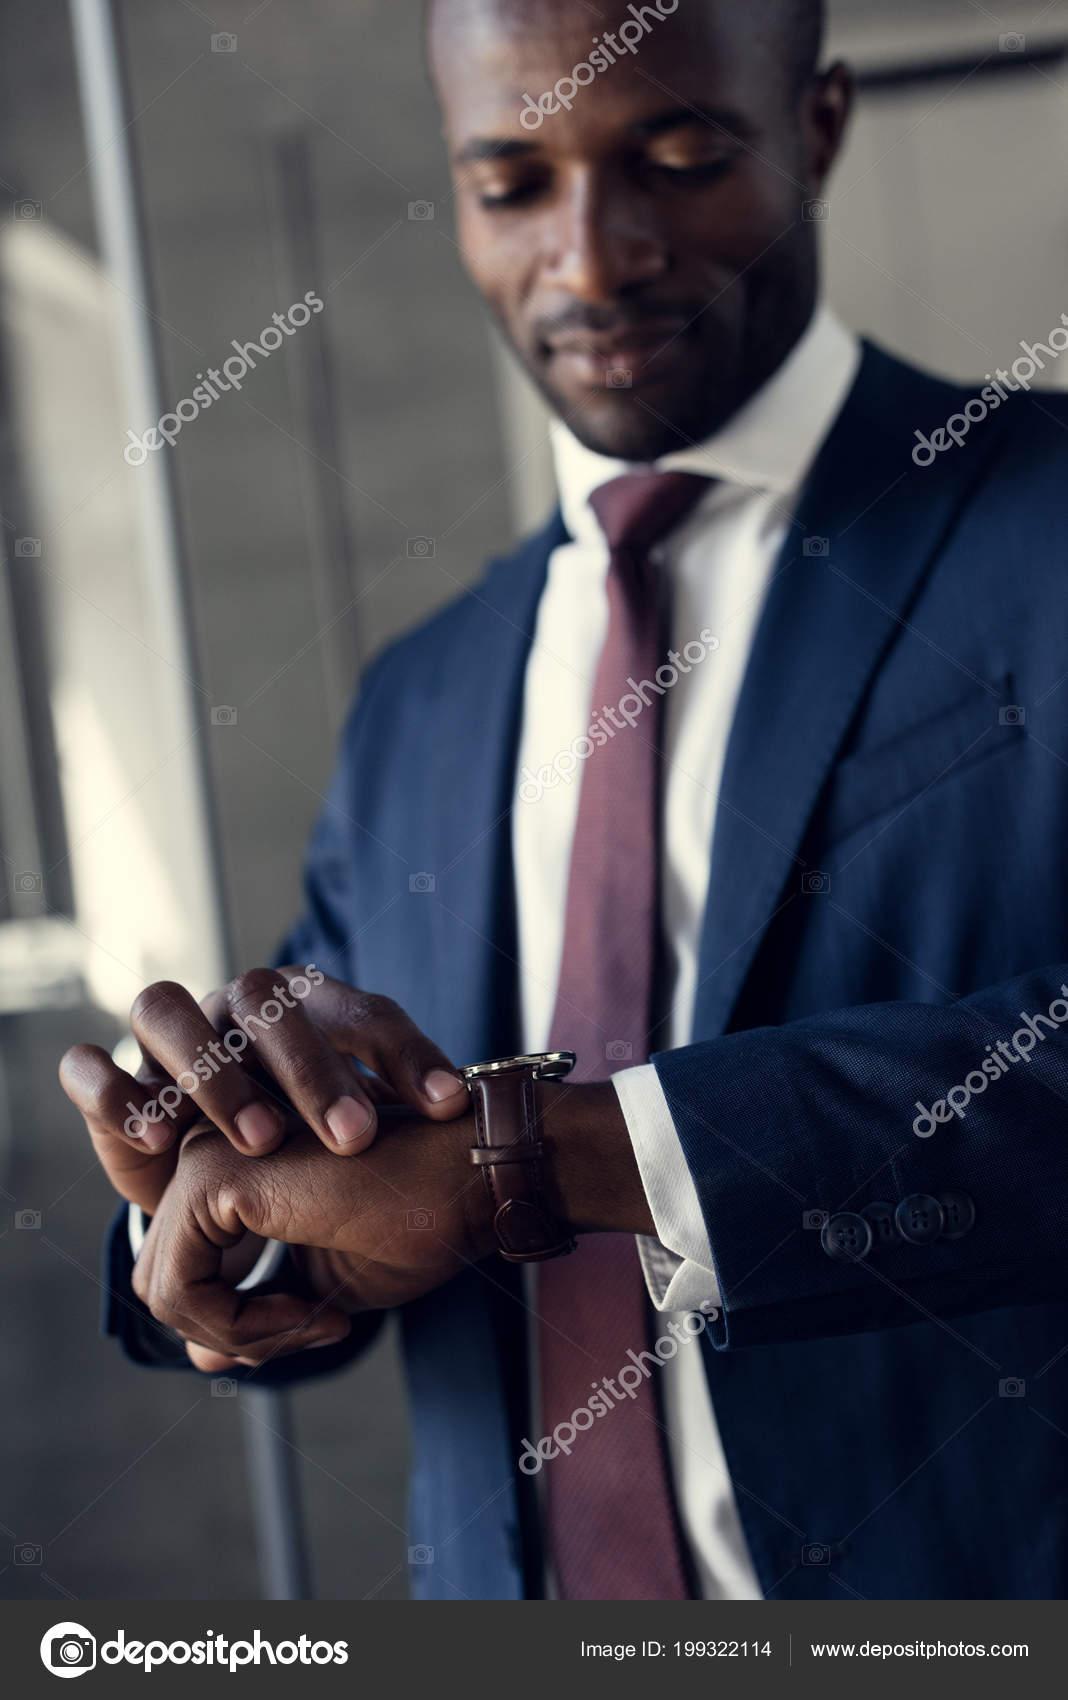 Primer plano retrato de hombre de negocios joven guapo traje elegante  mirando el reloj de pulsera — Foto de AllaSerebrina 1aa1e8e38eb5